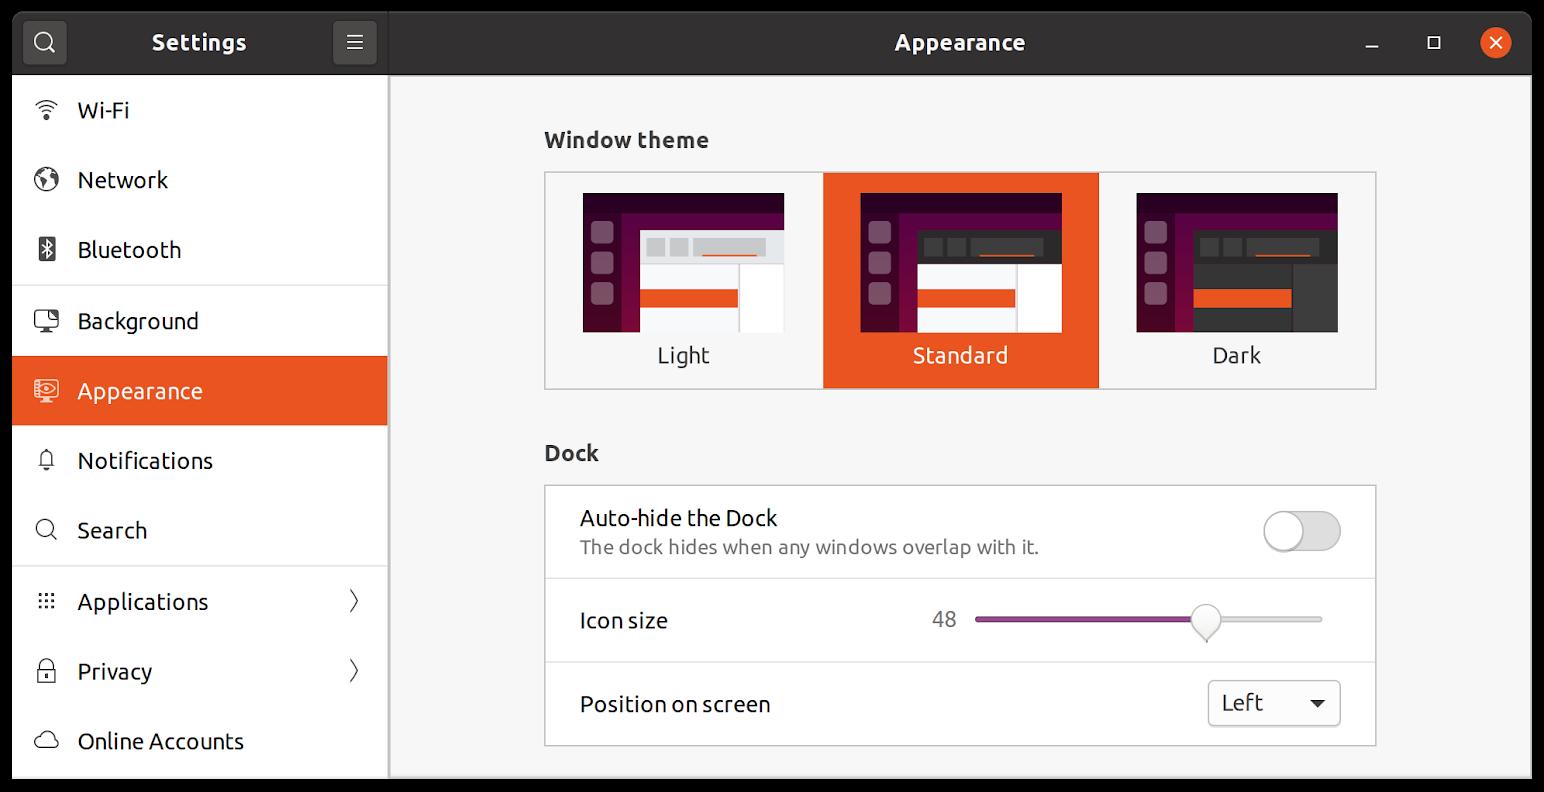 Ubuntu 20.04 LTS Appearance Settings Window